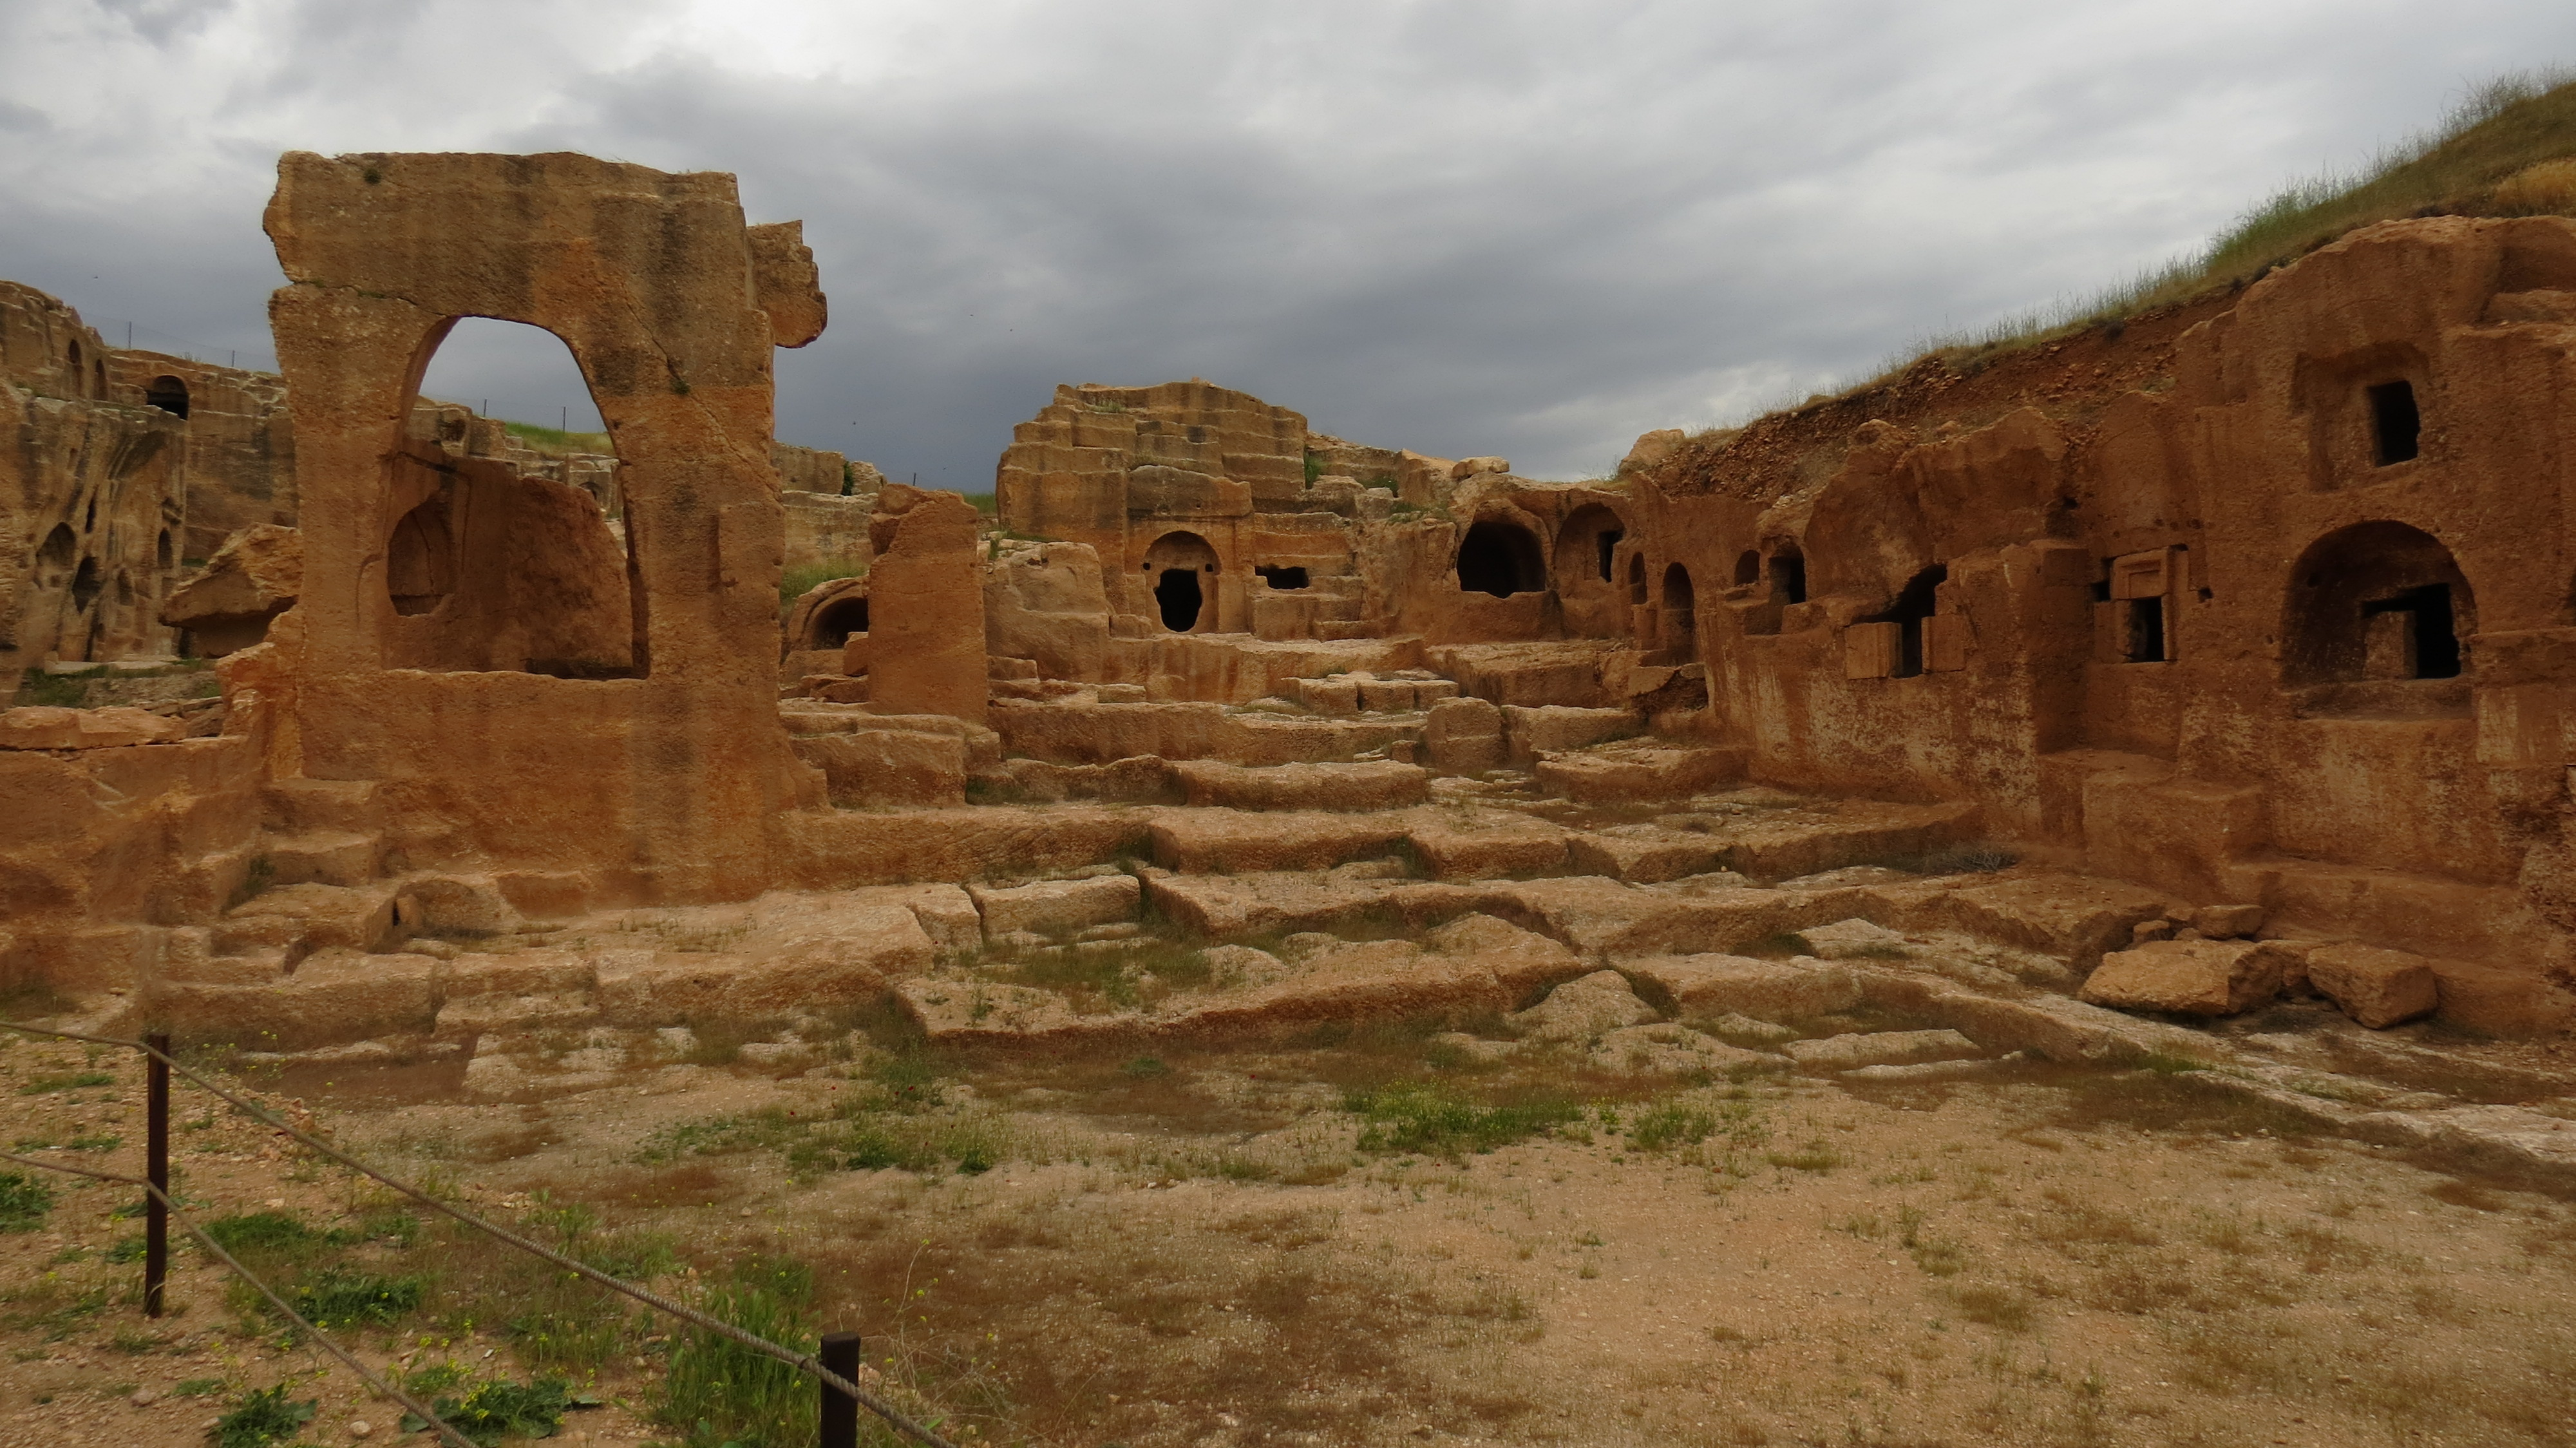 Luca Errera, Daniela Trastulli, Turchia, Mardin, Mardin, Dara, ancient city Dara